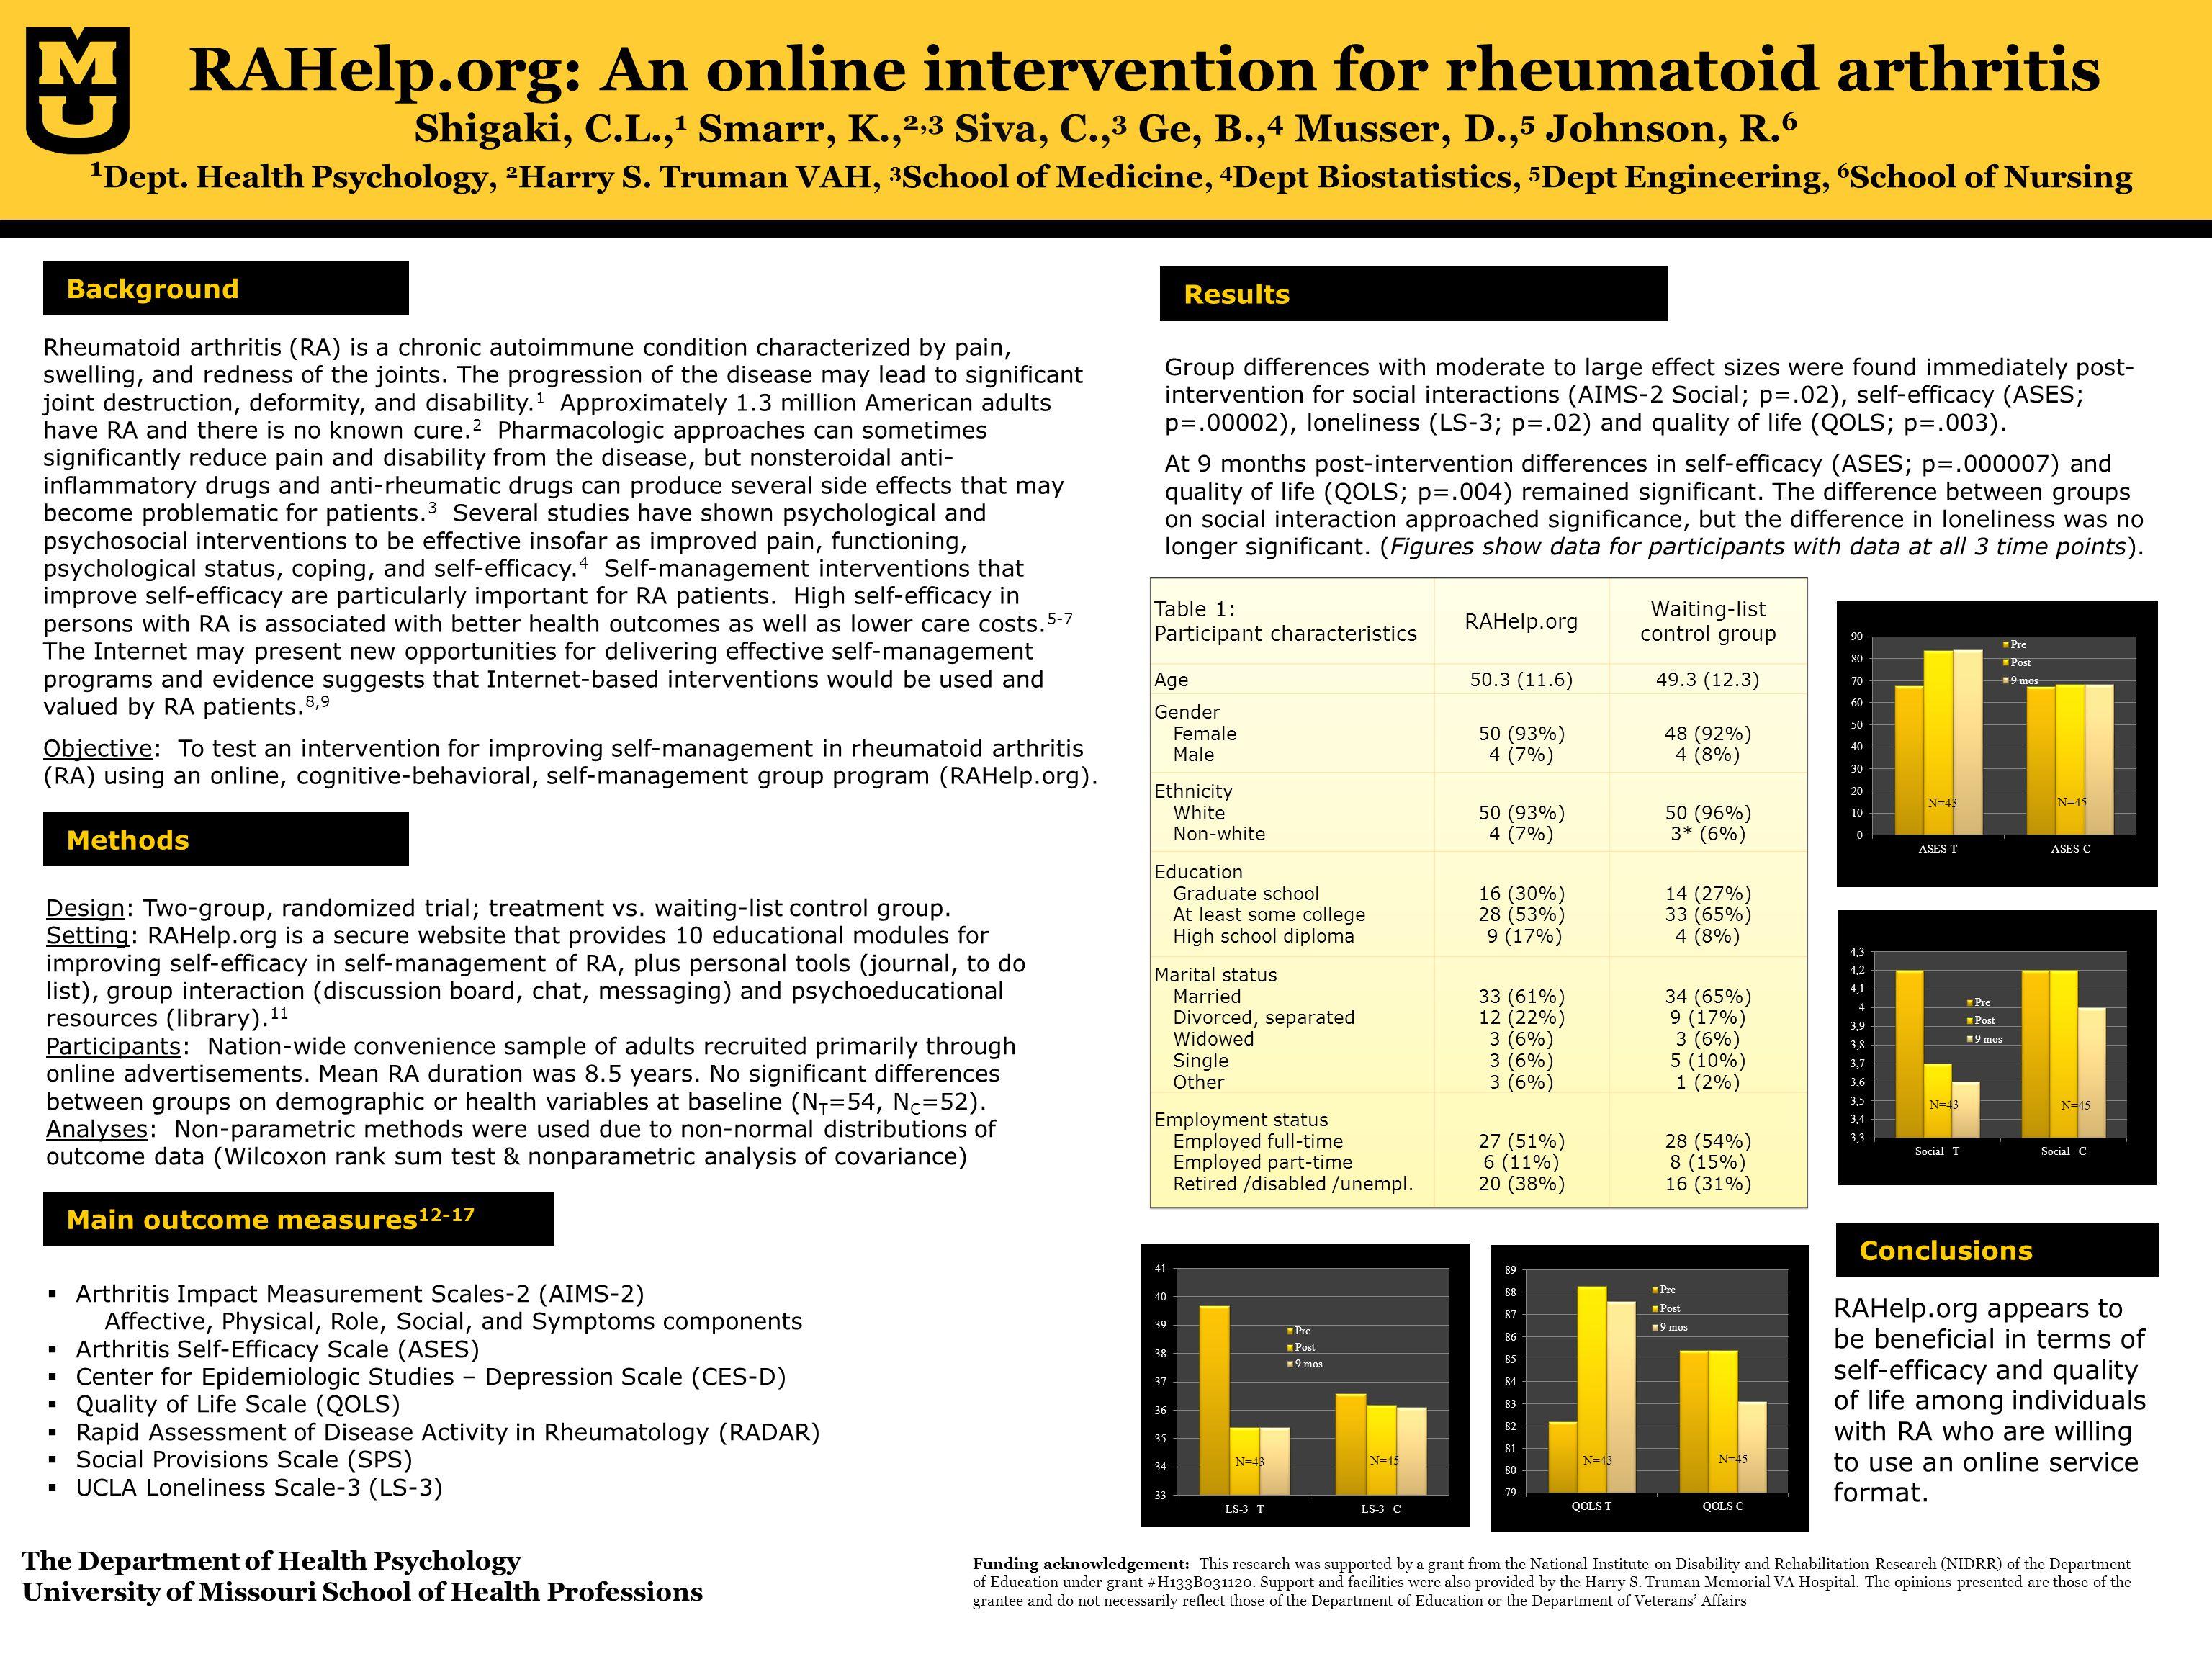 RAHelp.org: An online intervention for rheumatoid arthritis Shigaki, C.L., 1 Smarr, K., 2,3 Siva, C., 3 Ge, B., 4 Musser, D., 5 Johnson, R.